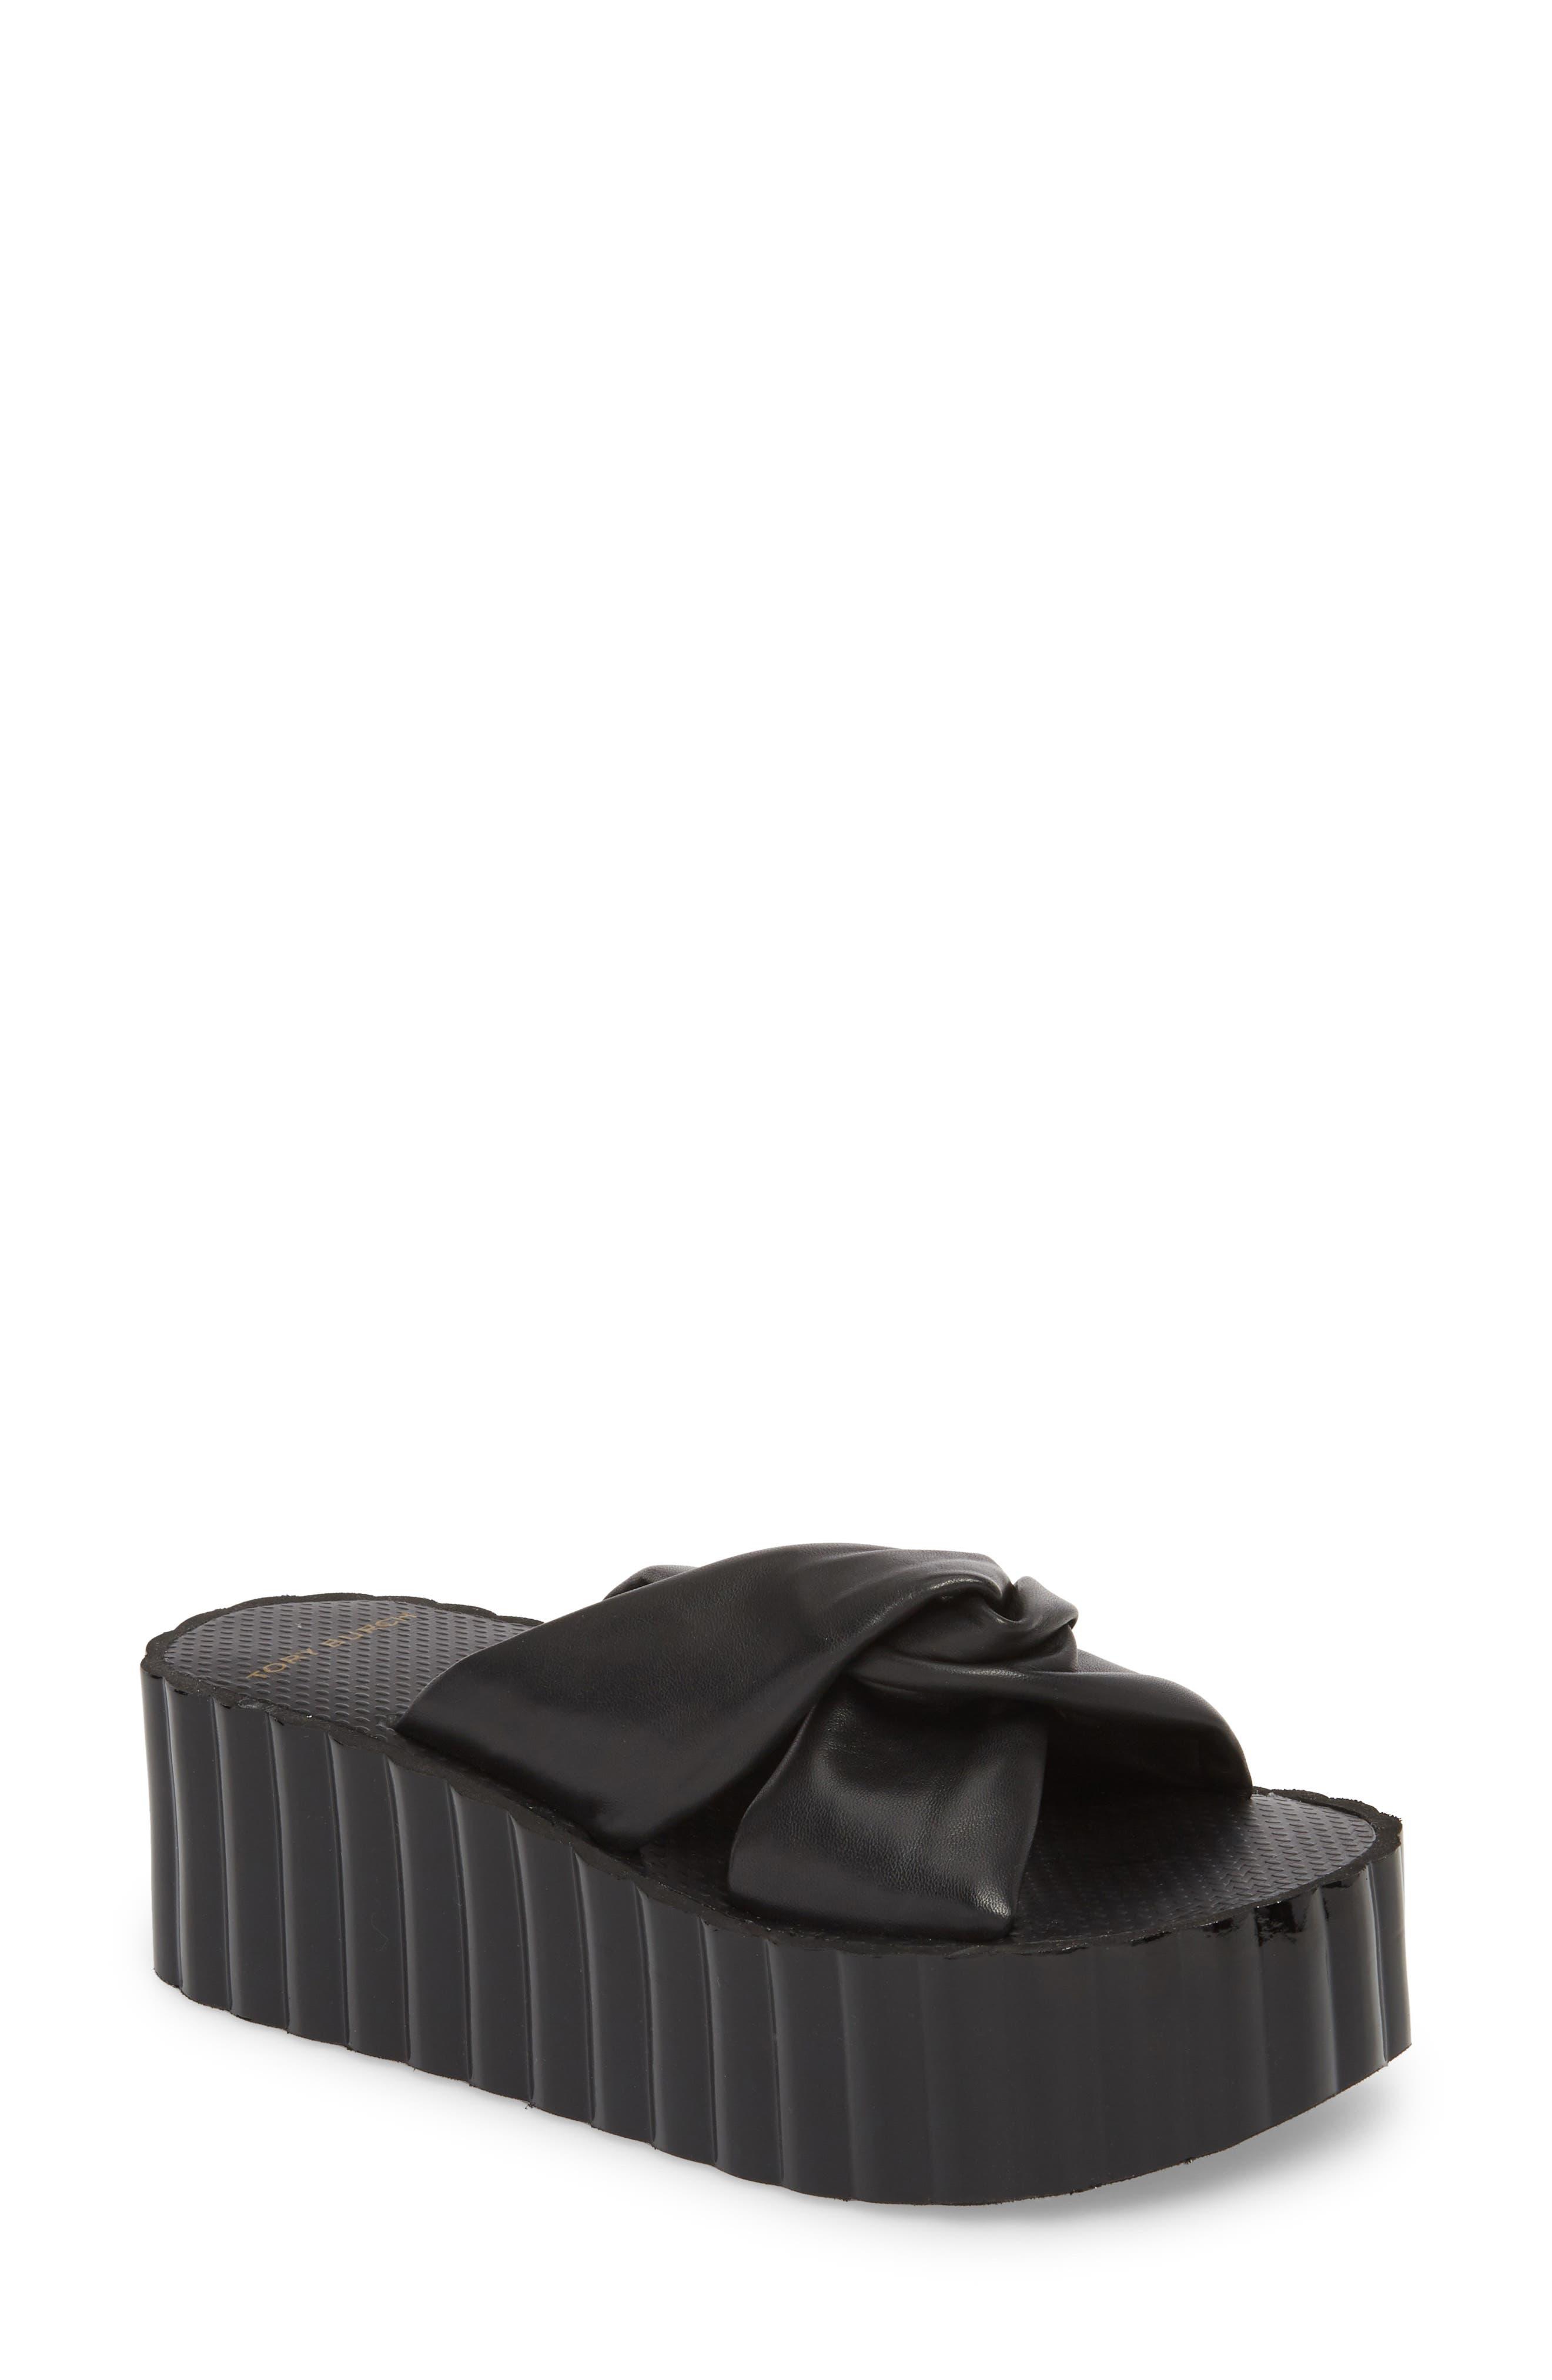 TORY BURCH Scallop Platform Slide Sandal, Main, color, 006